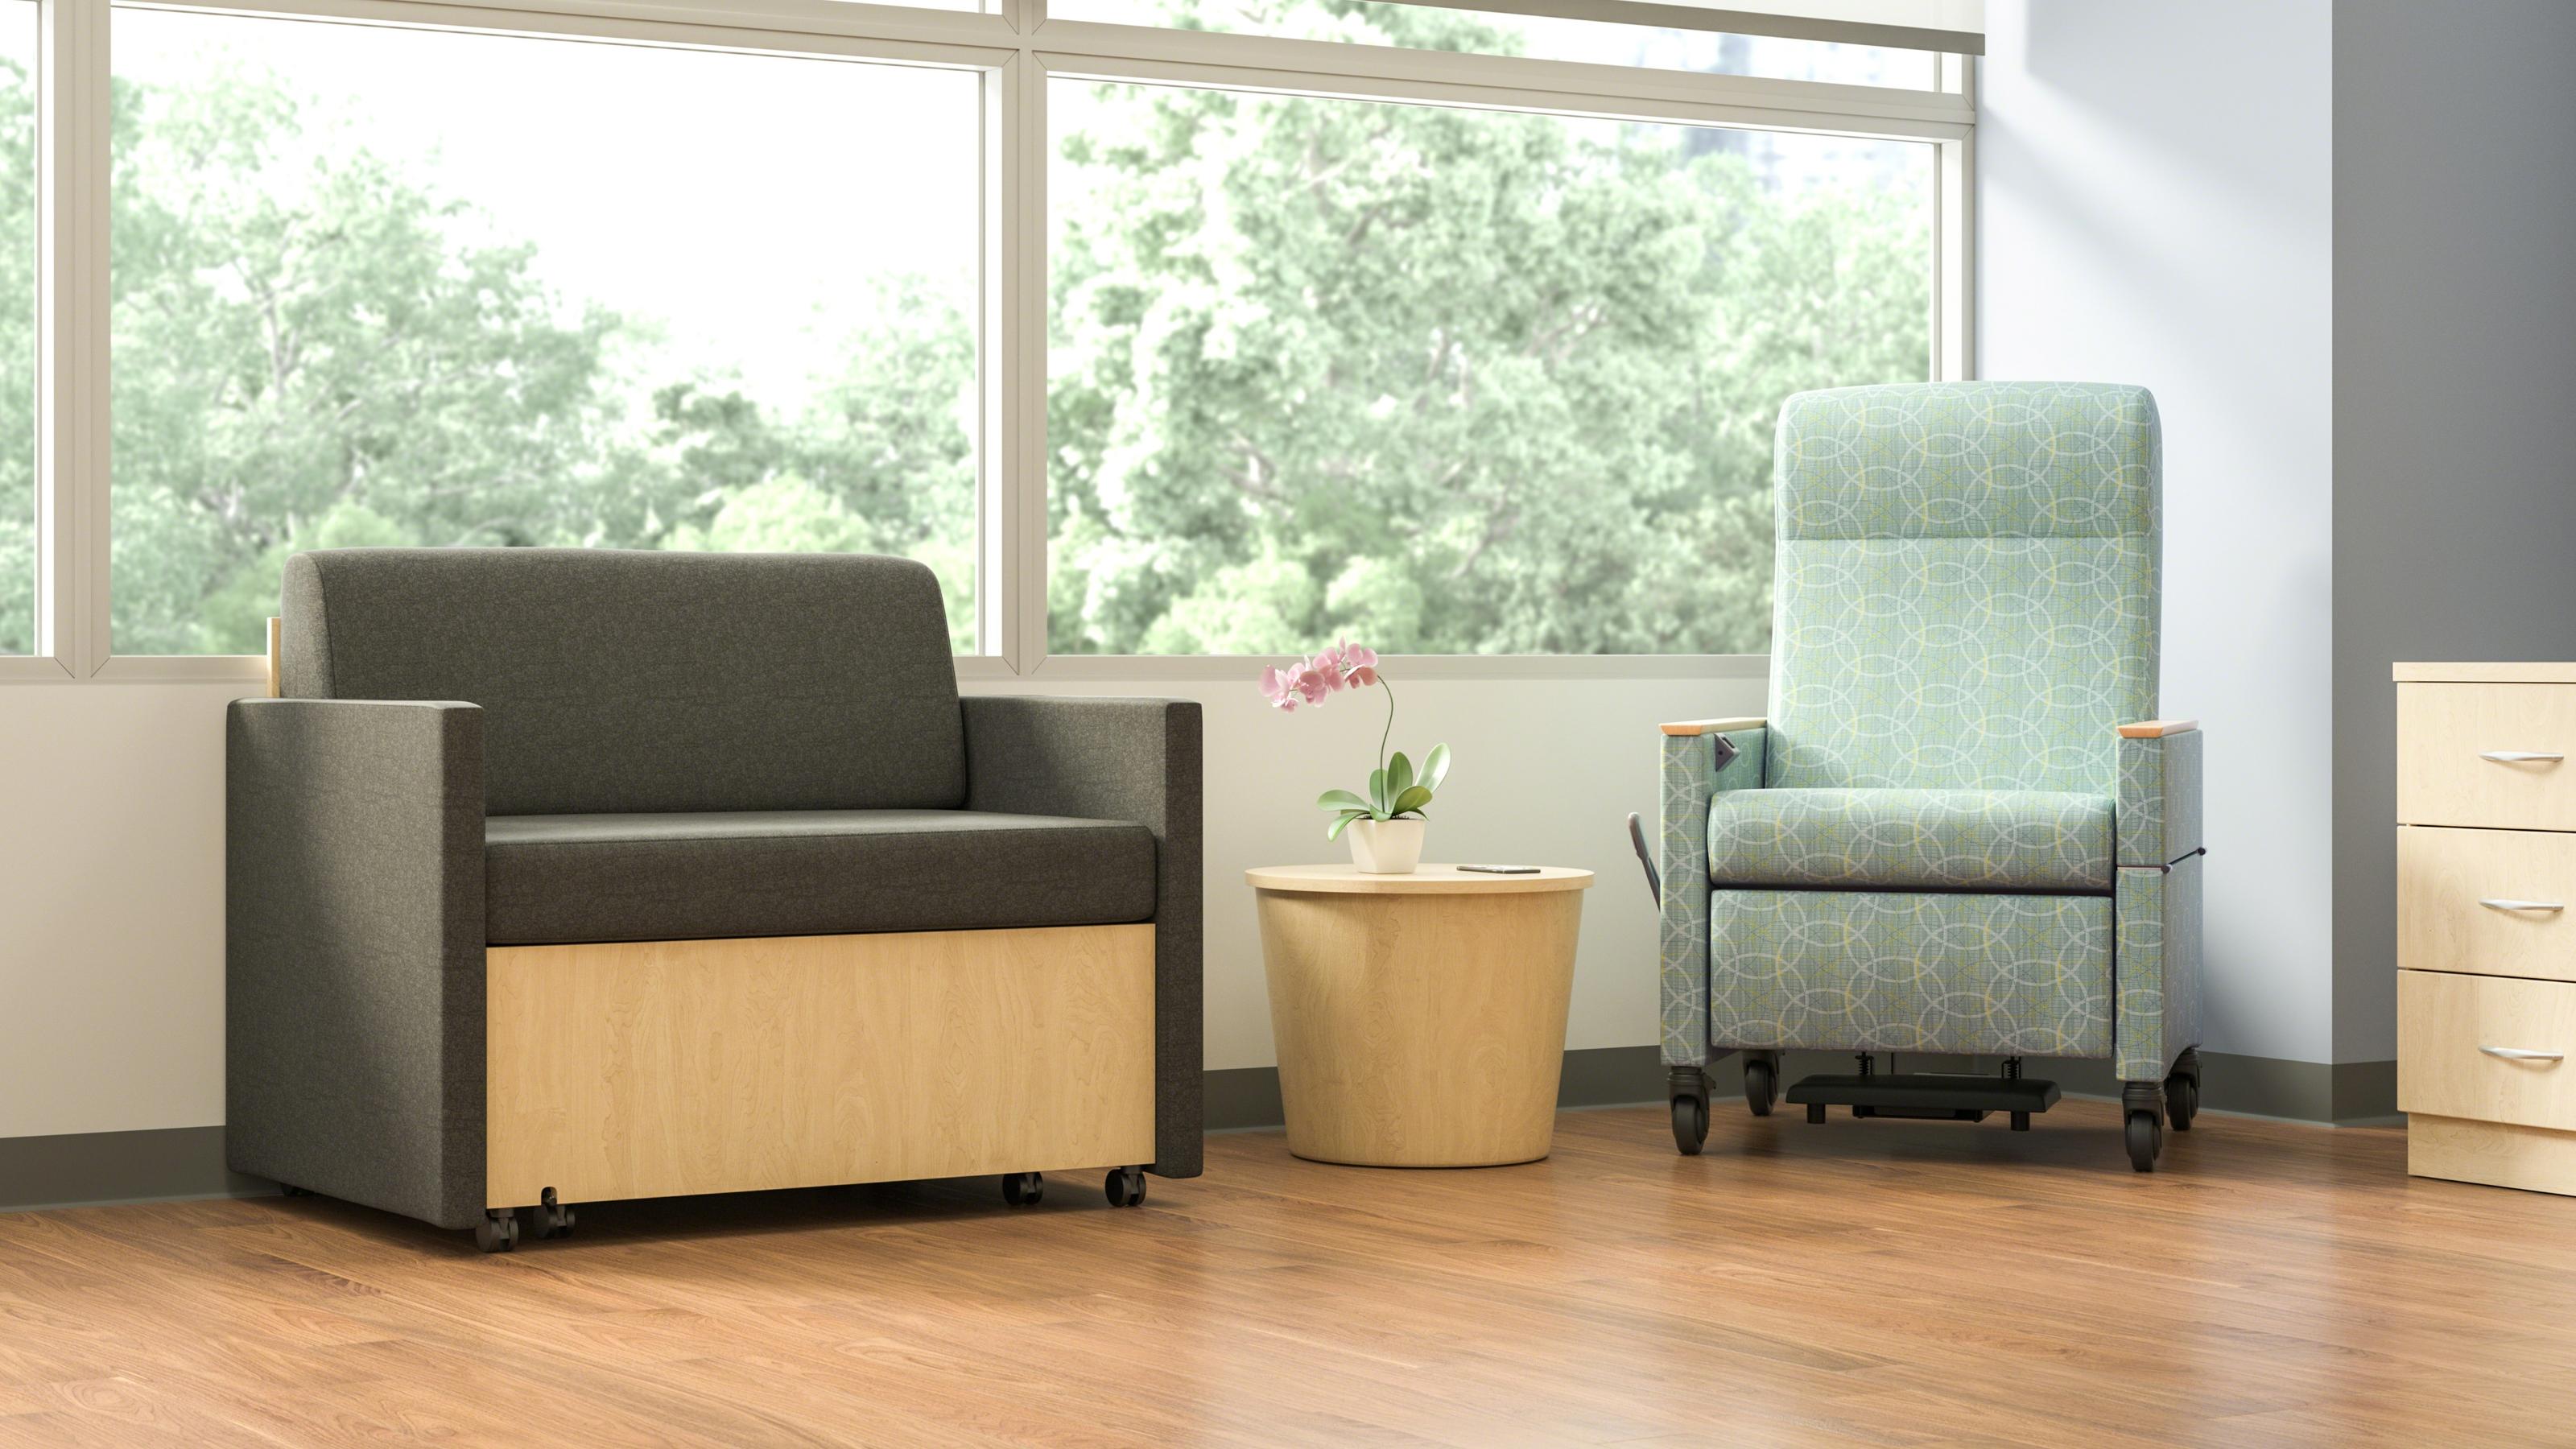 X tenz & Double X tenz Hospital Sofa Sleepers Steelcase